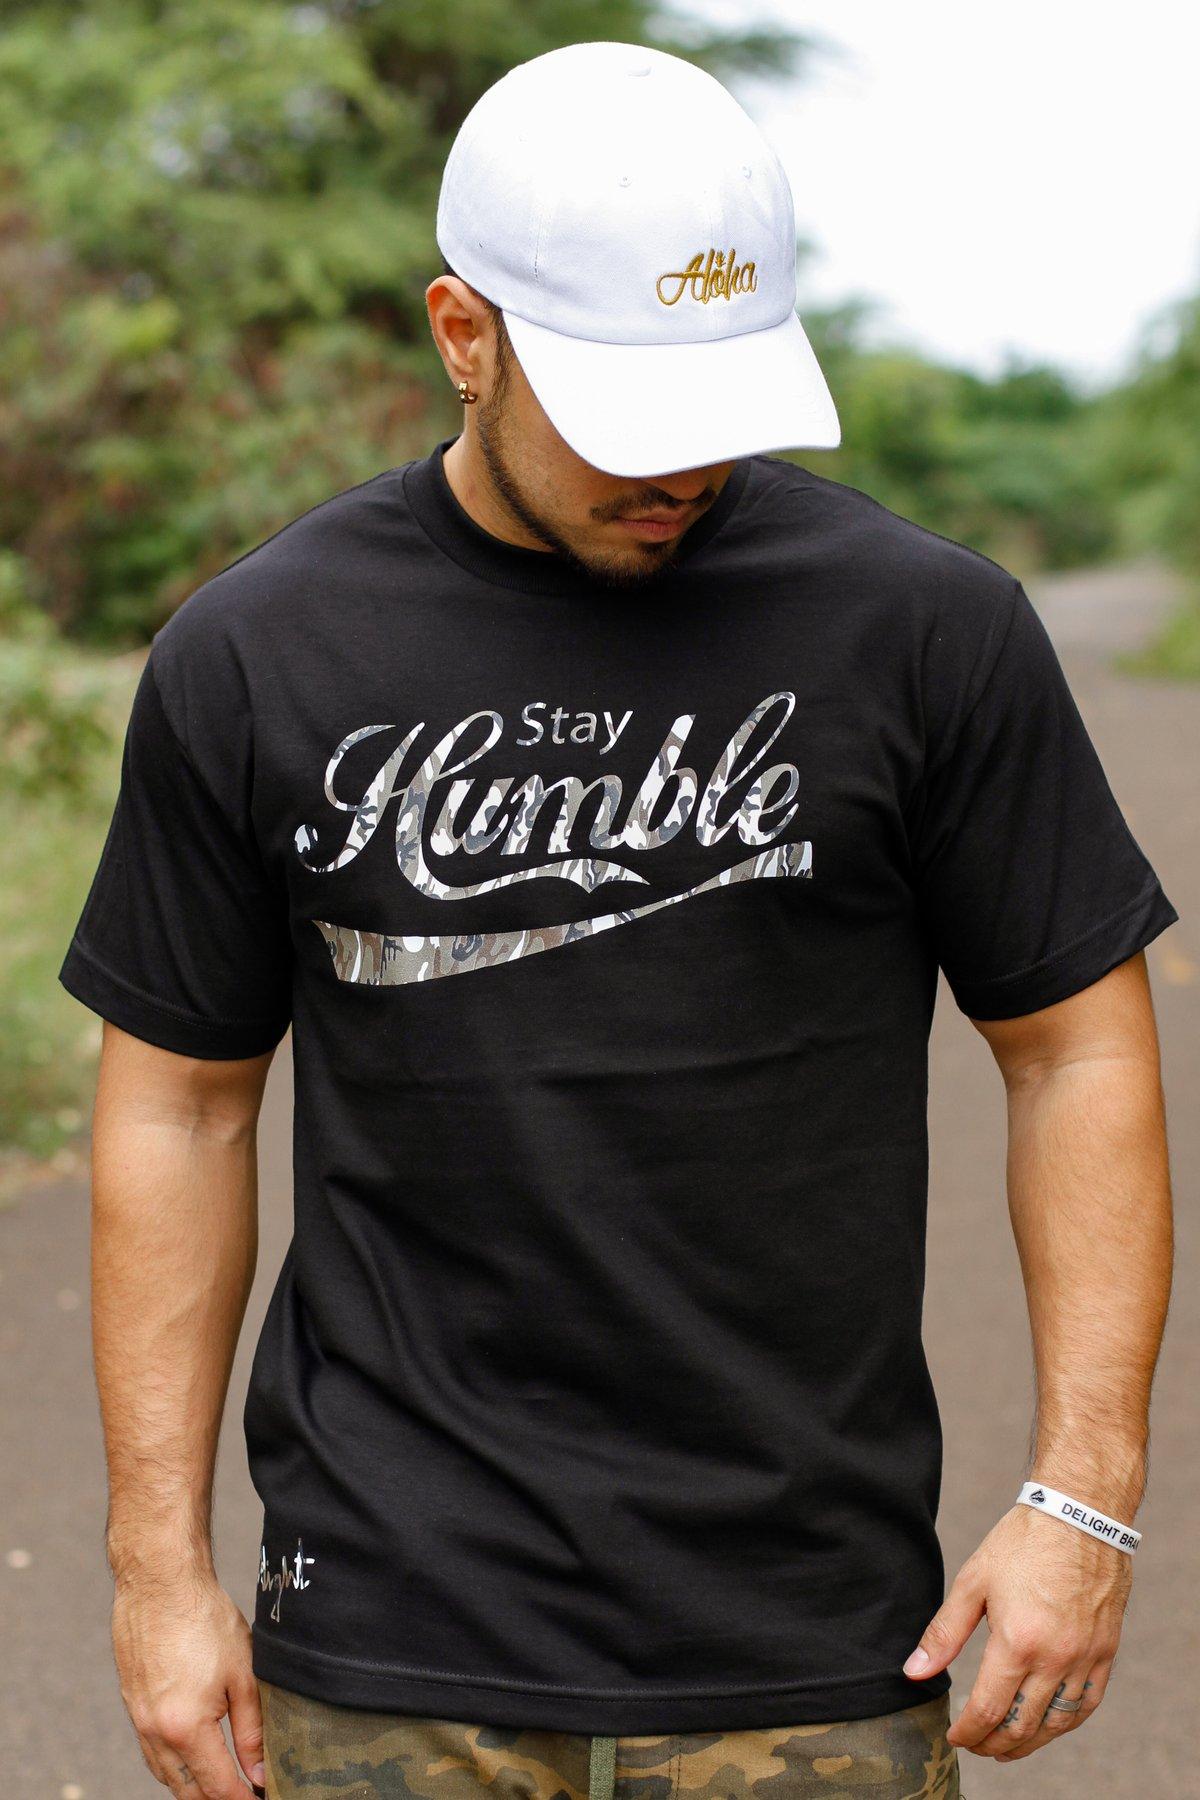 Stay Humble Tee (Black/Camo)